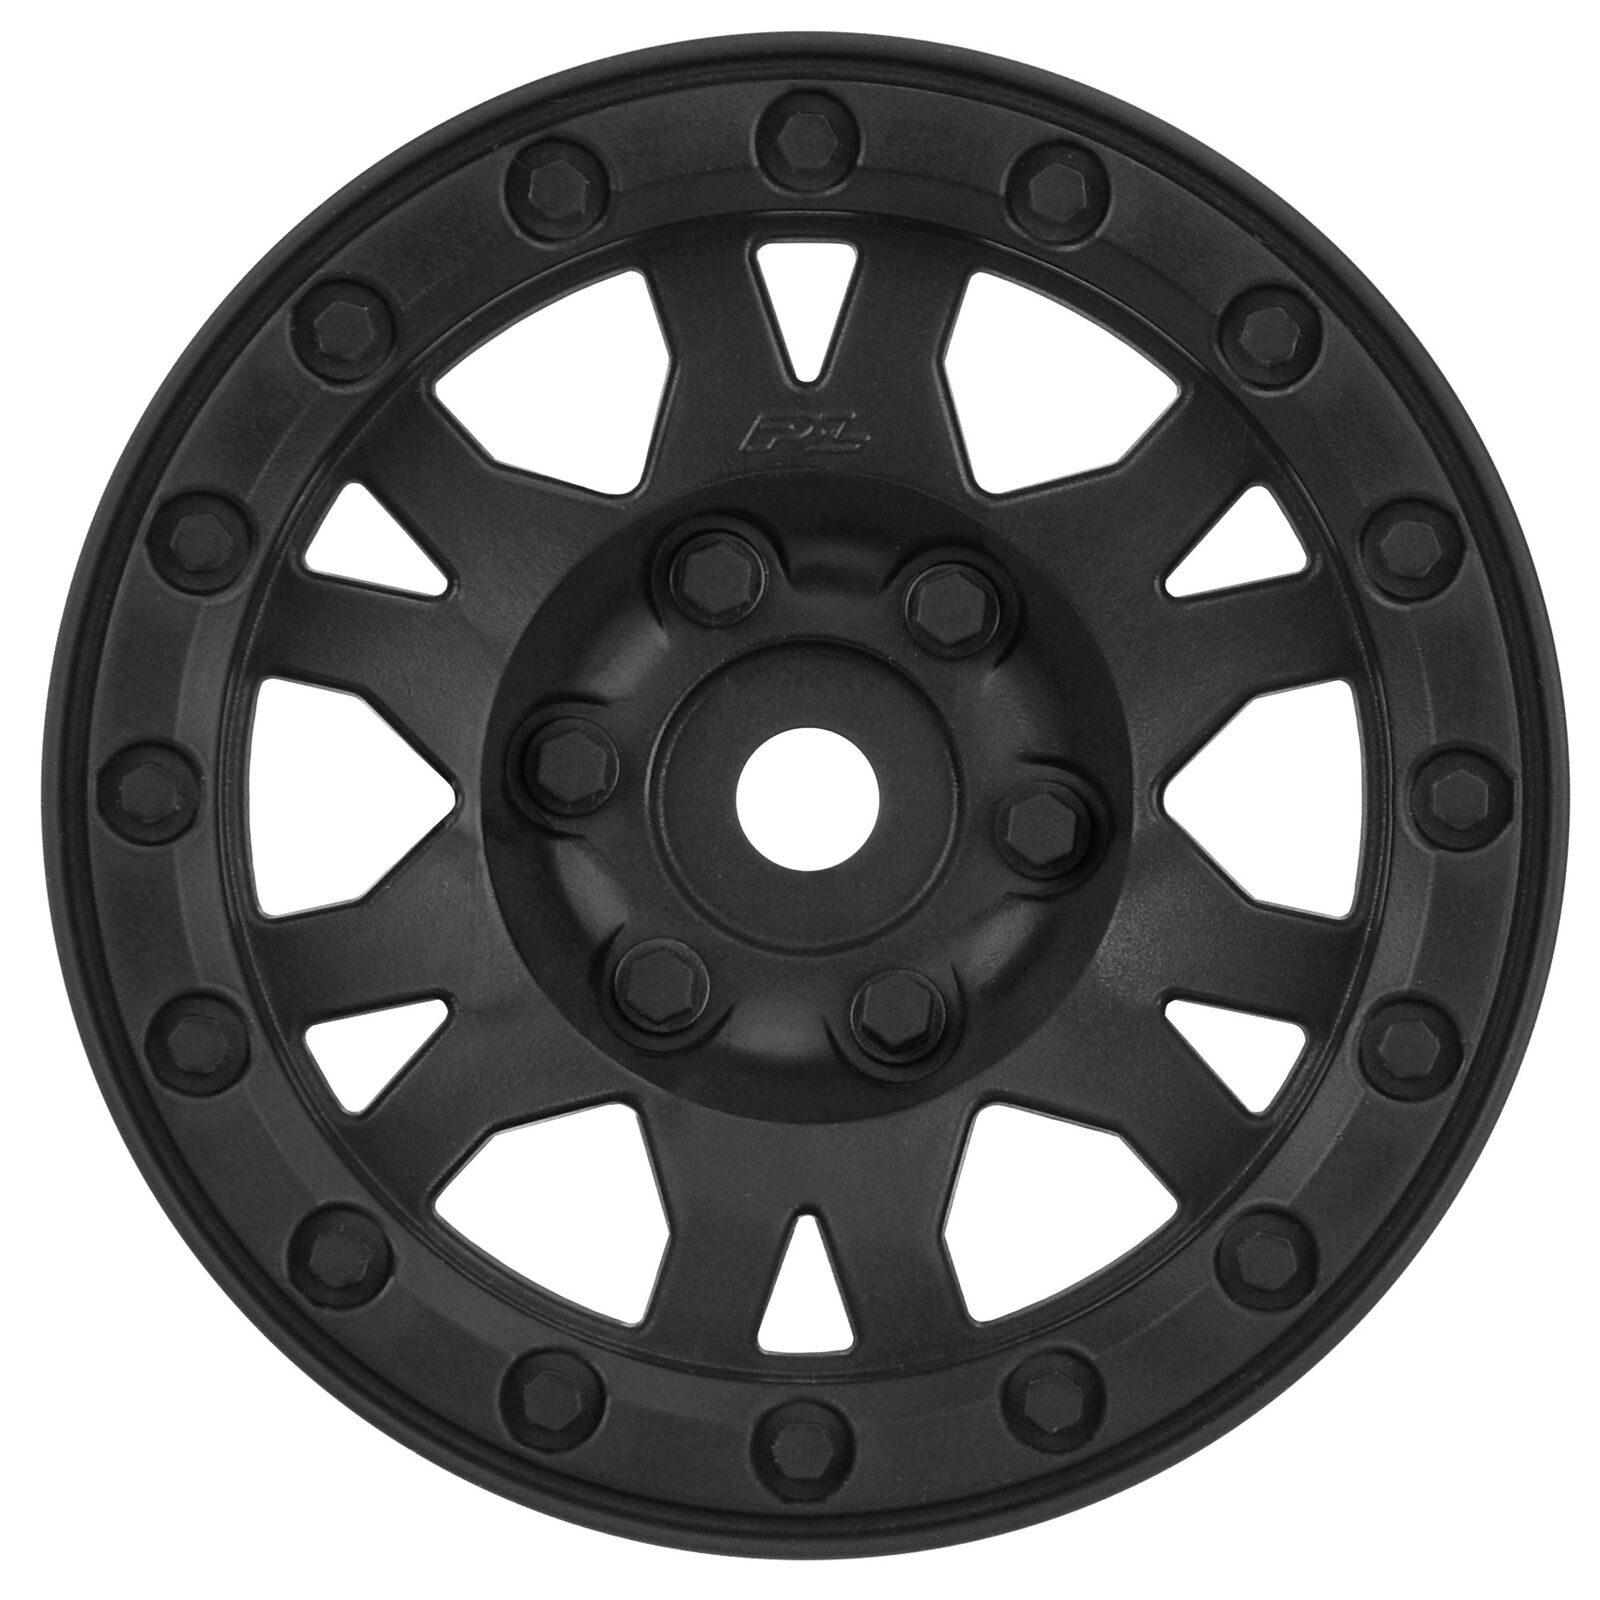 "1/10 Impulse Front/Rear 1.9"" 12mm Rock Crawler Wheels (2) Black"